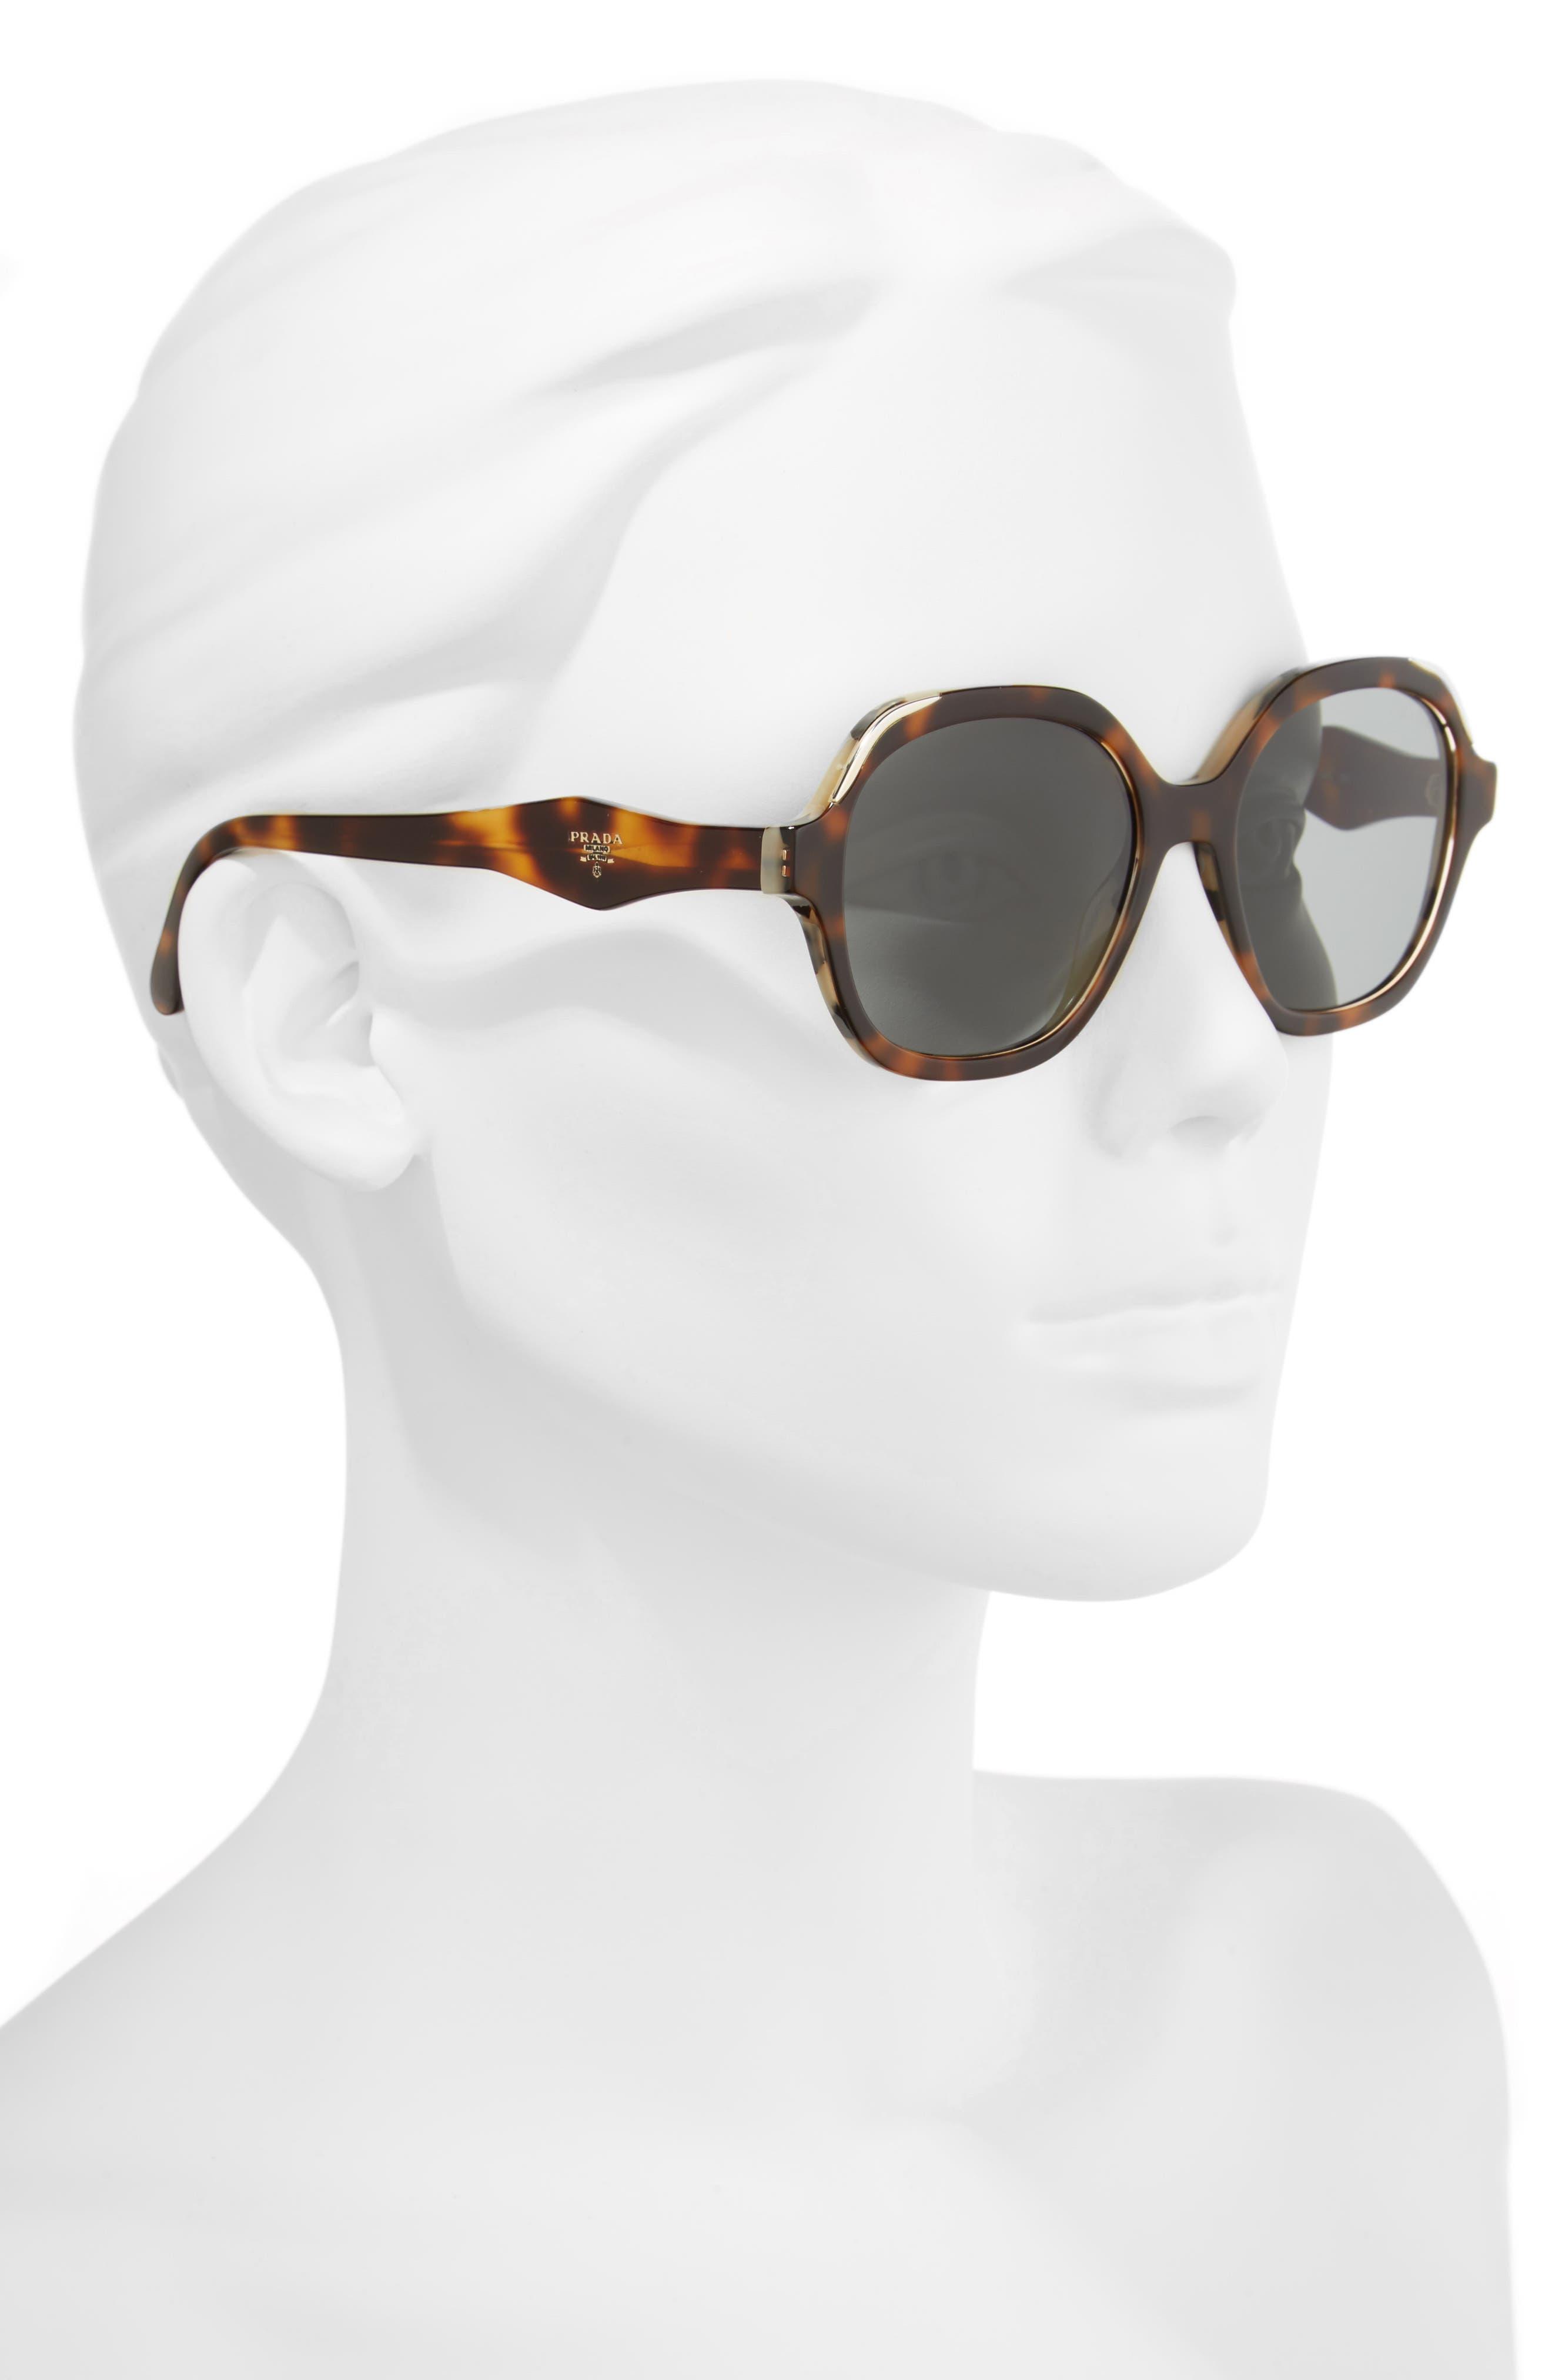 50mm Square Sunglasses,                             Alternate thumbnail 2, color,